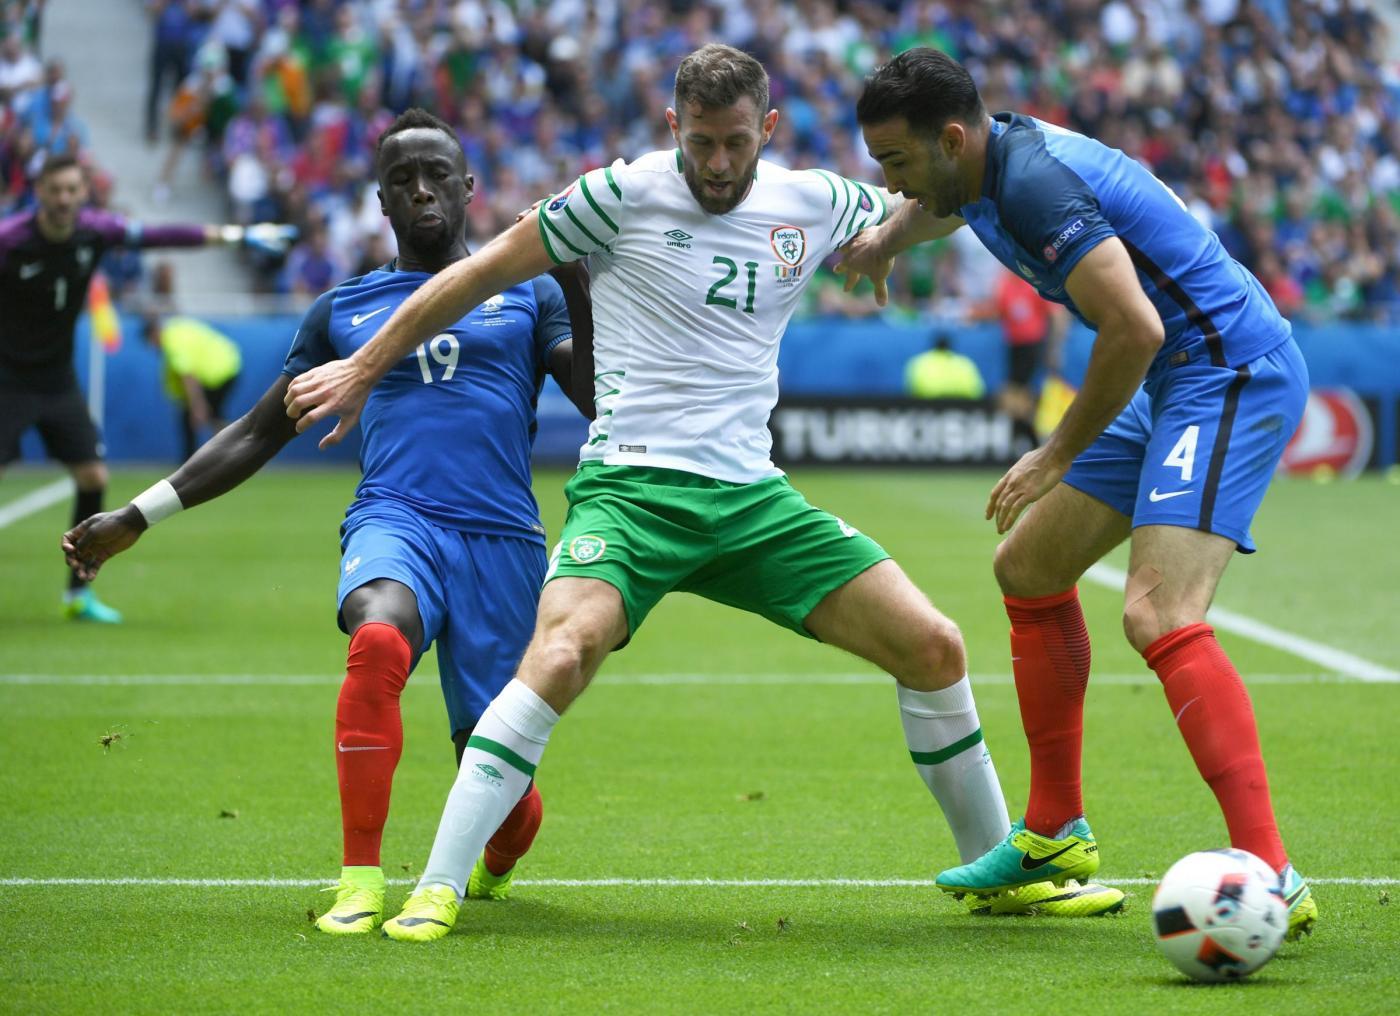 francia- islanda - photo #9